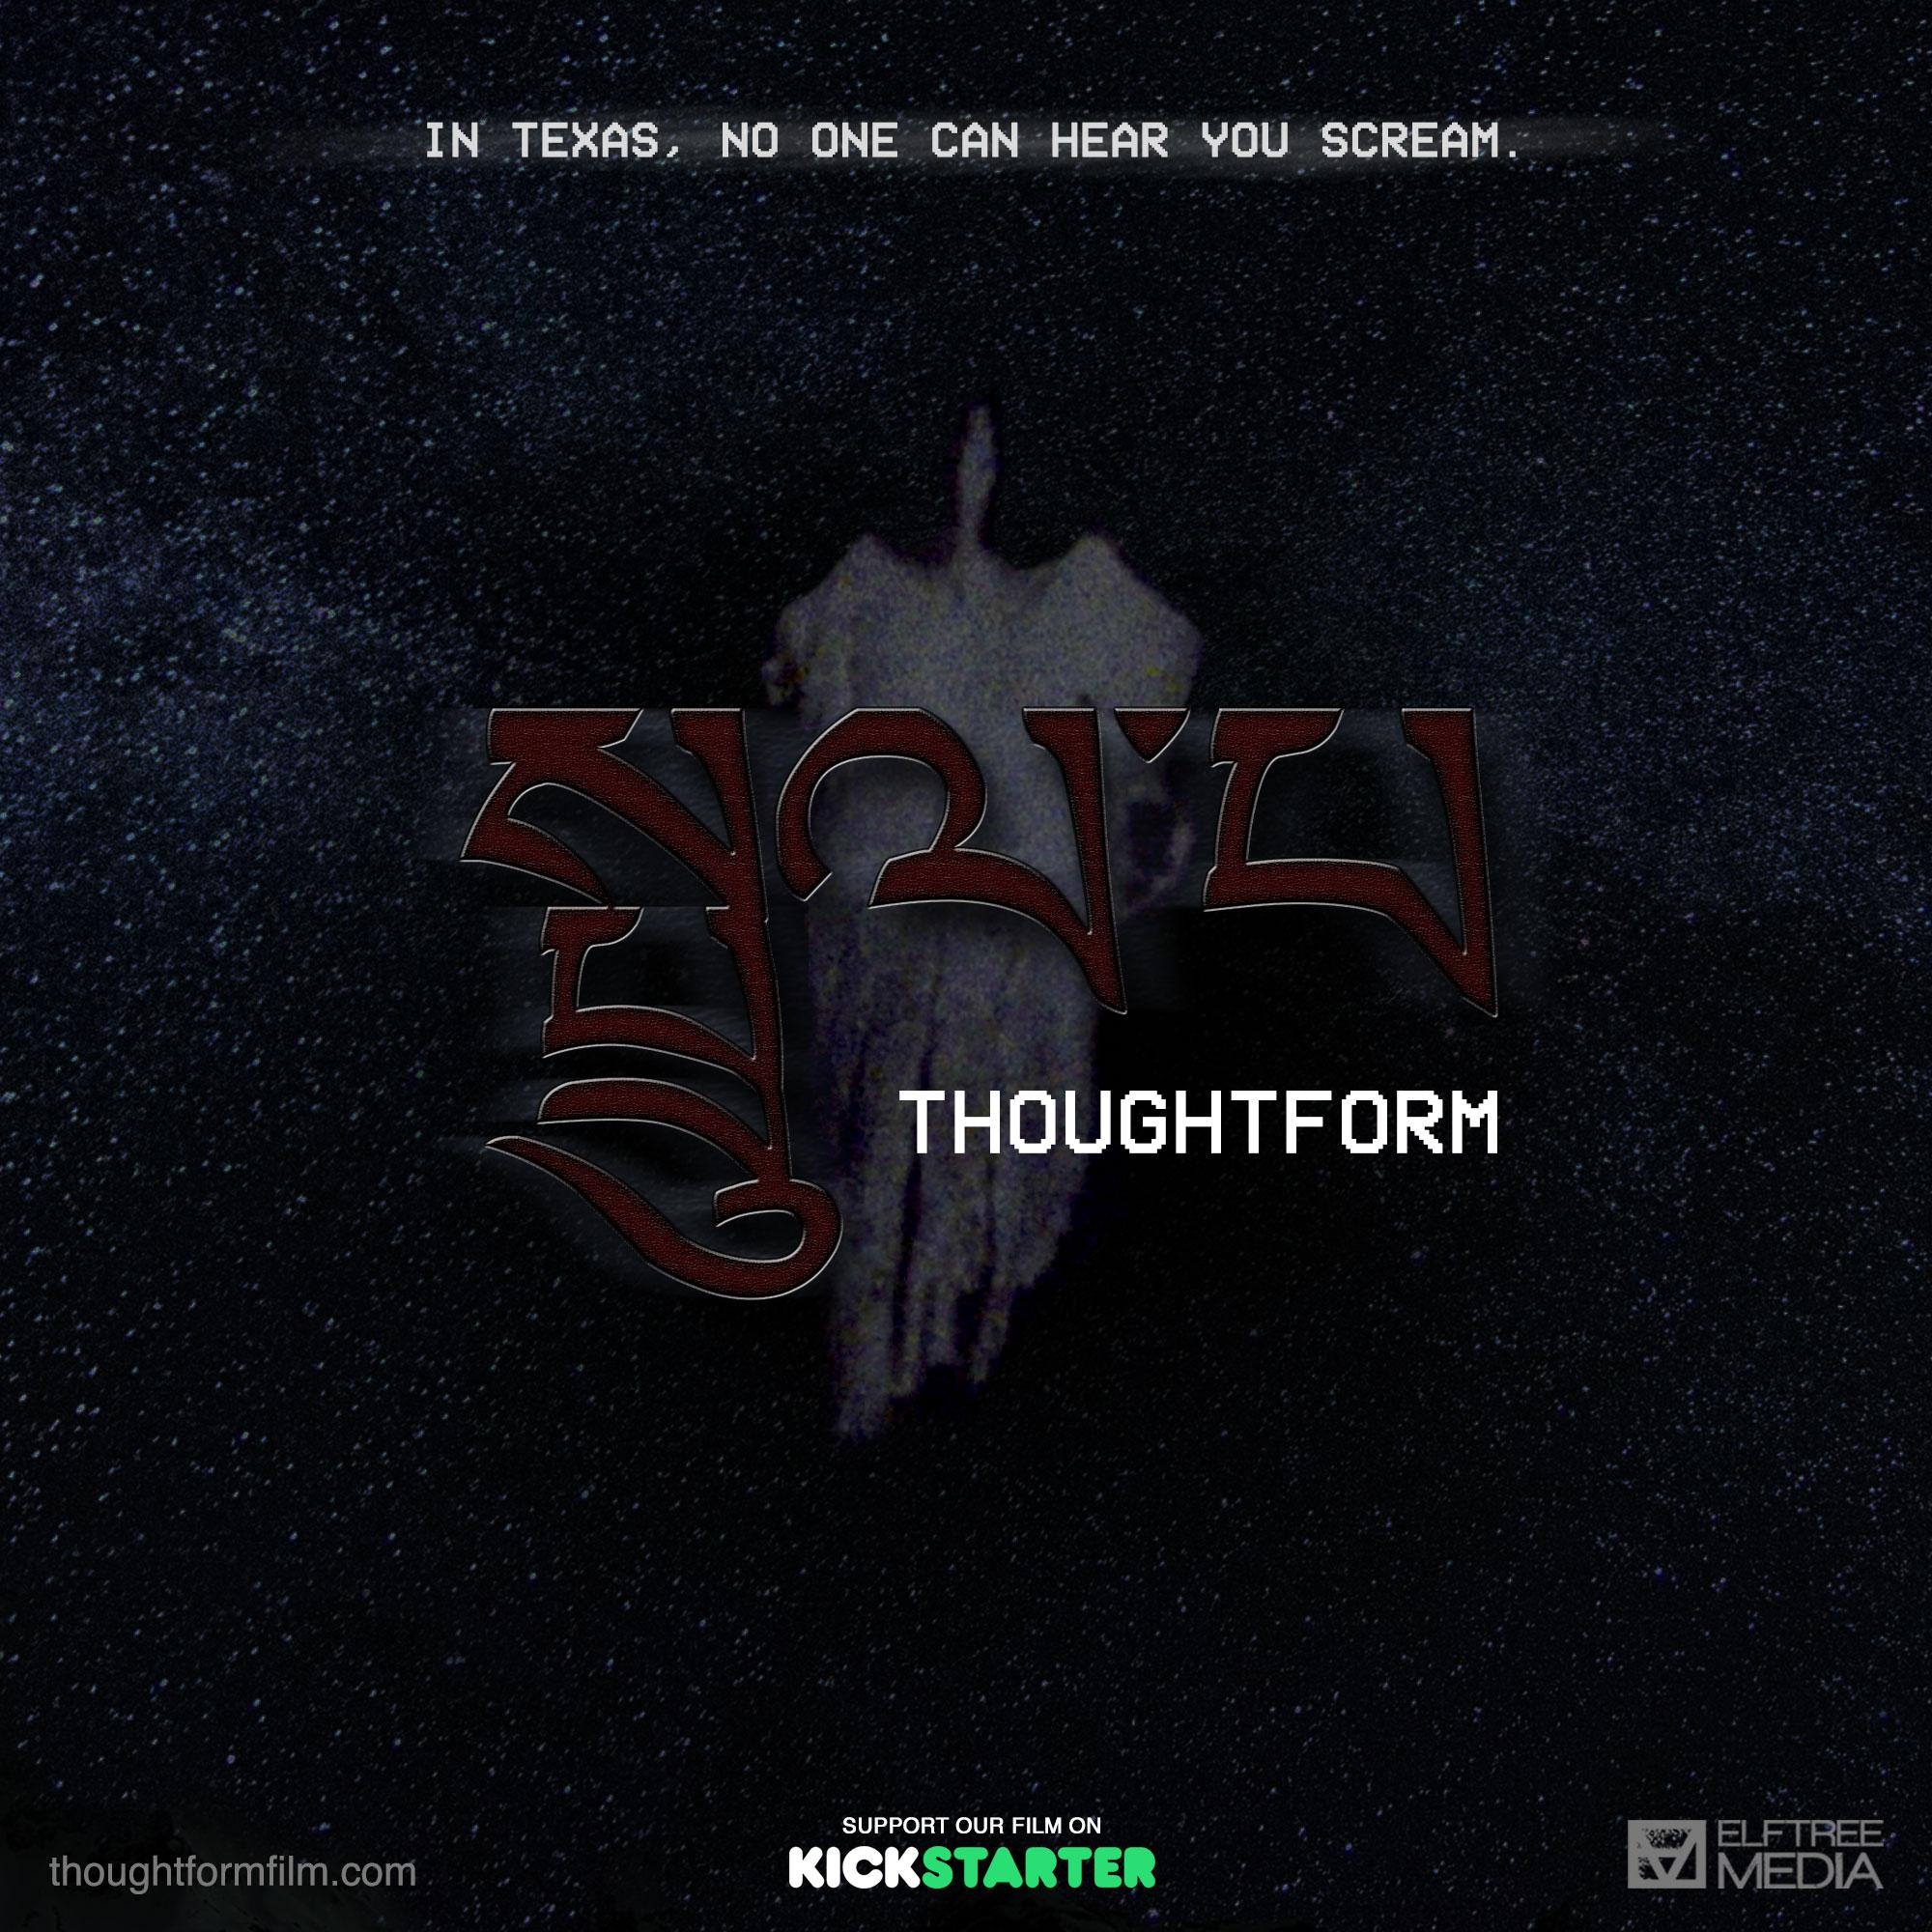 IG-Thoughtform-1.jpg